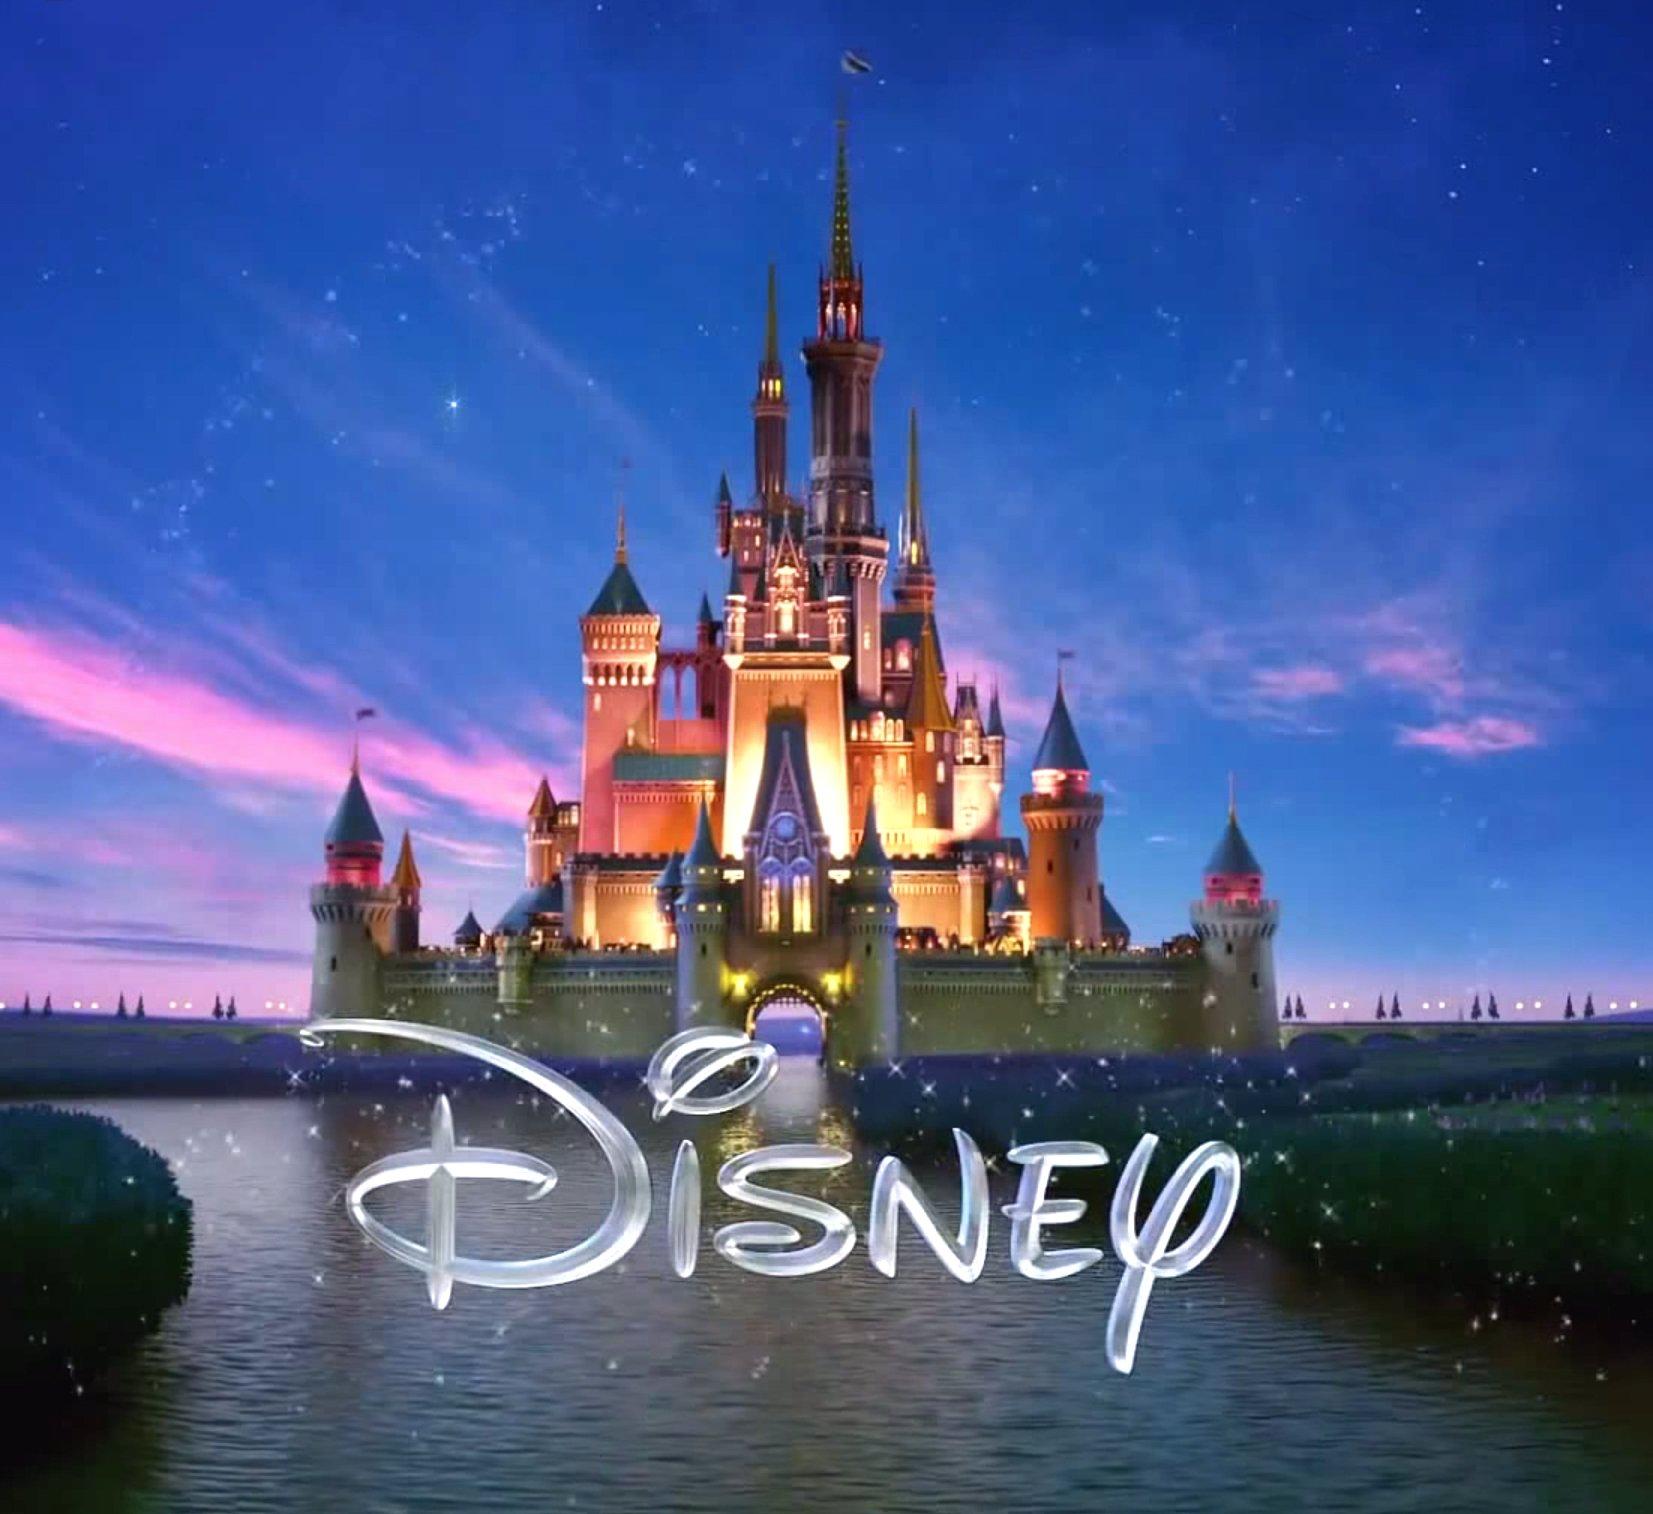 Walt Disney Logo, symbol, meaning, History and Evolution